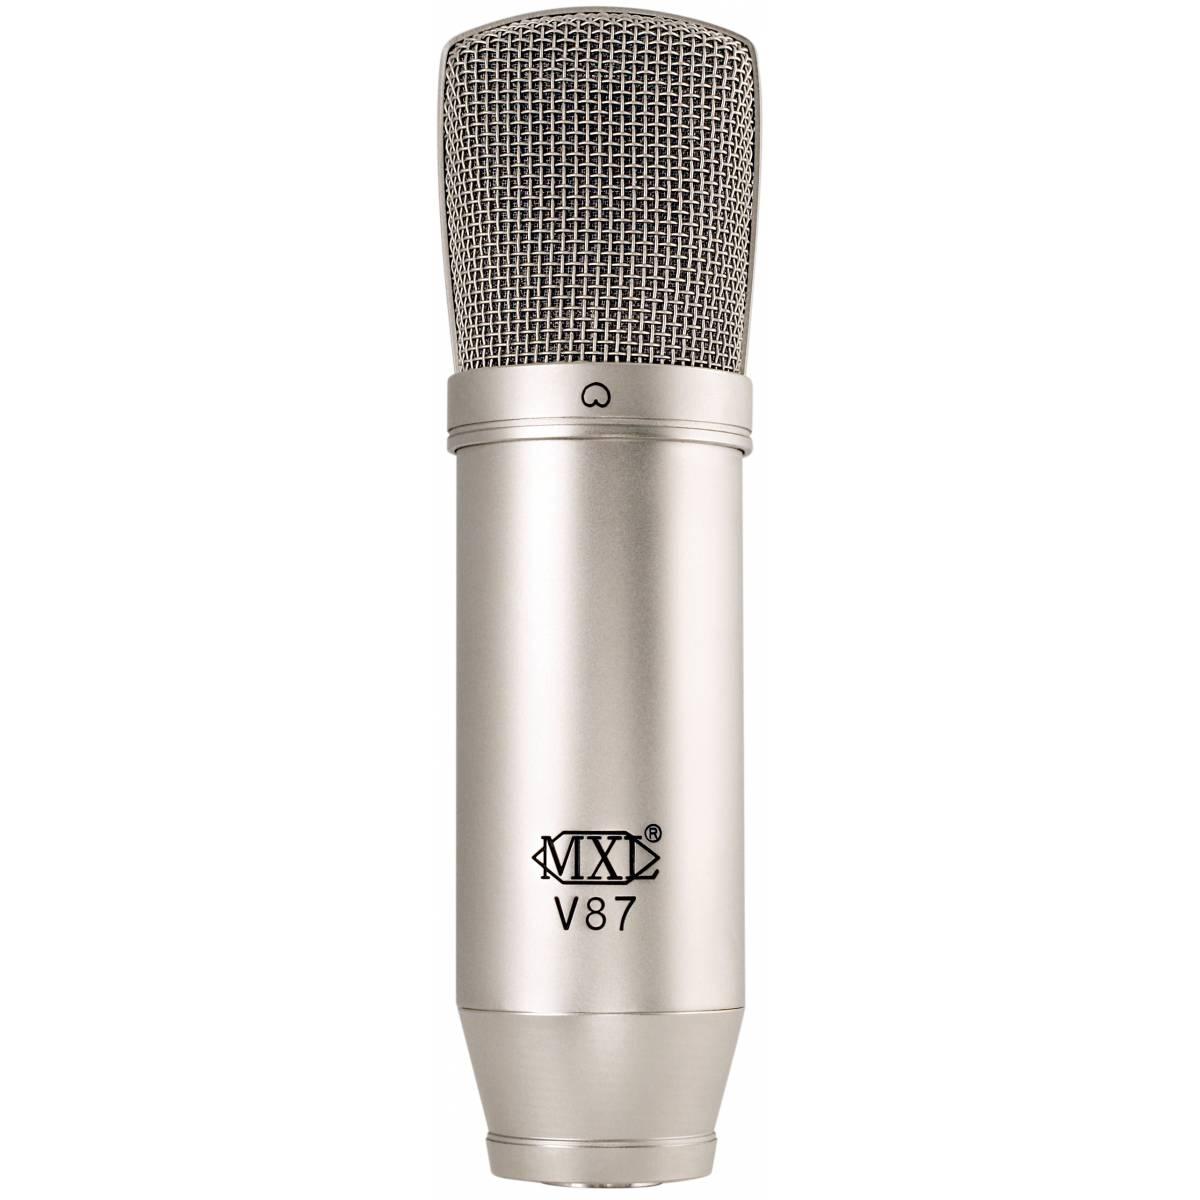 mxl v87 condenser microphone condenser microphones from inta audio uk. Black Bedroom Furniture Sets. Home Design Ideas